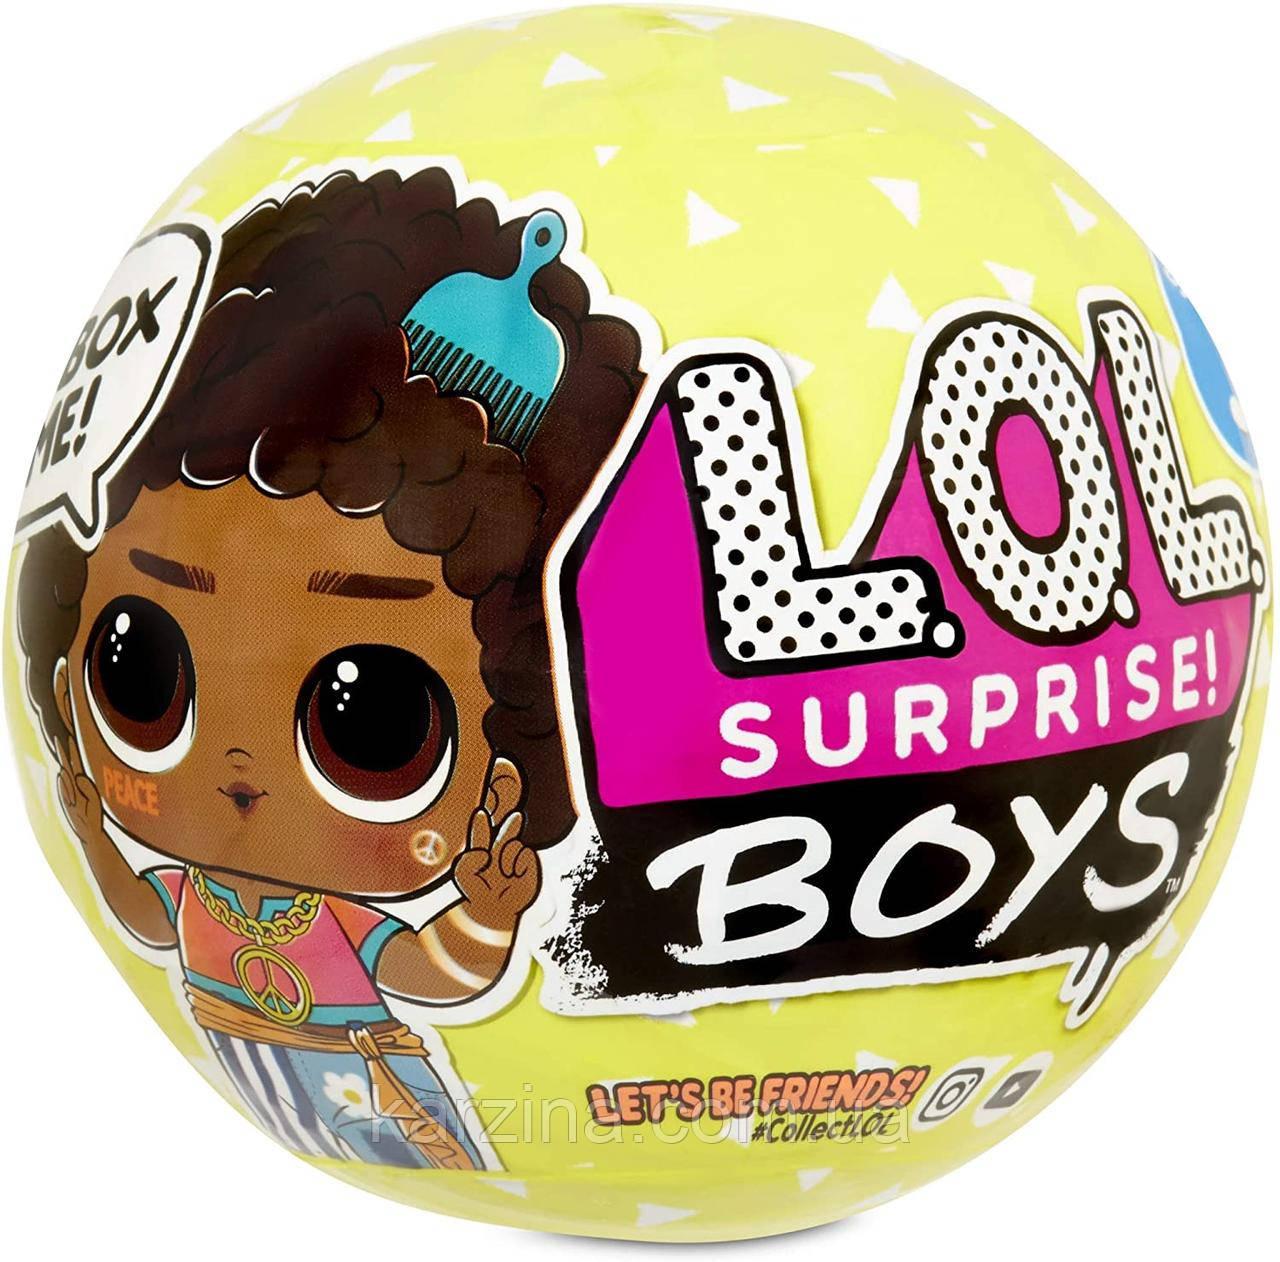 L.O.L. Surprise Boys Series 3 ЛОЛ Мальчики 3 серия 100% Оригинал. MGA Entertainment